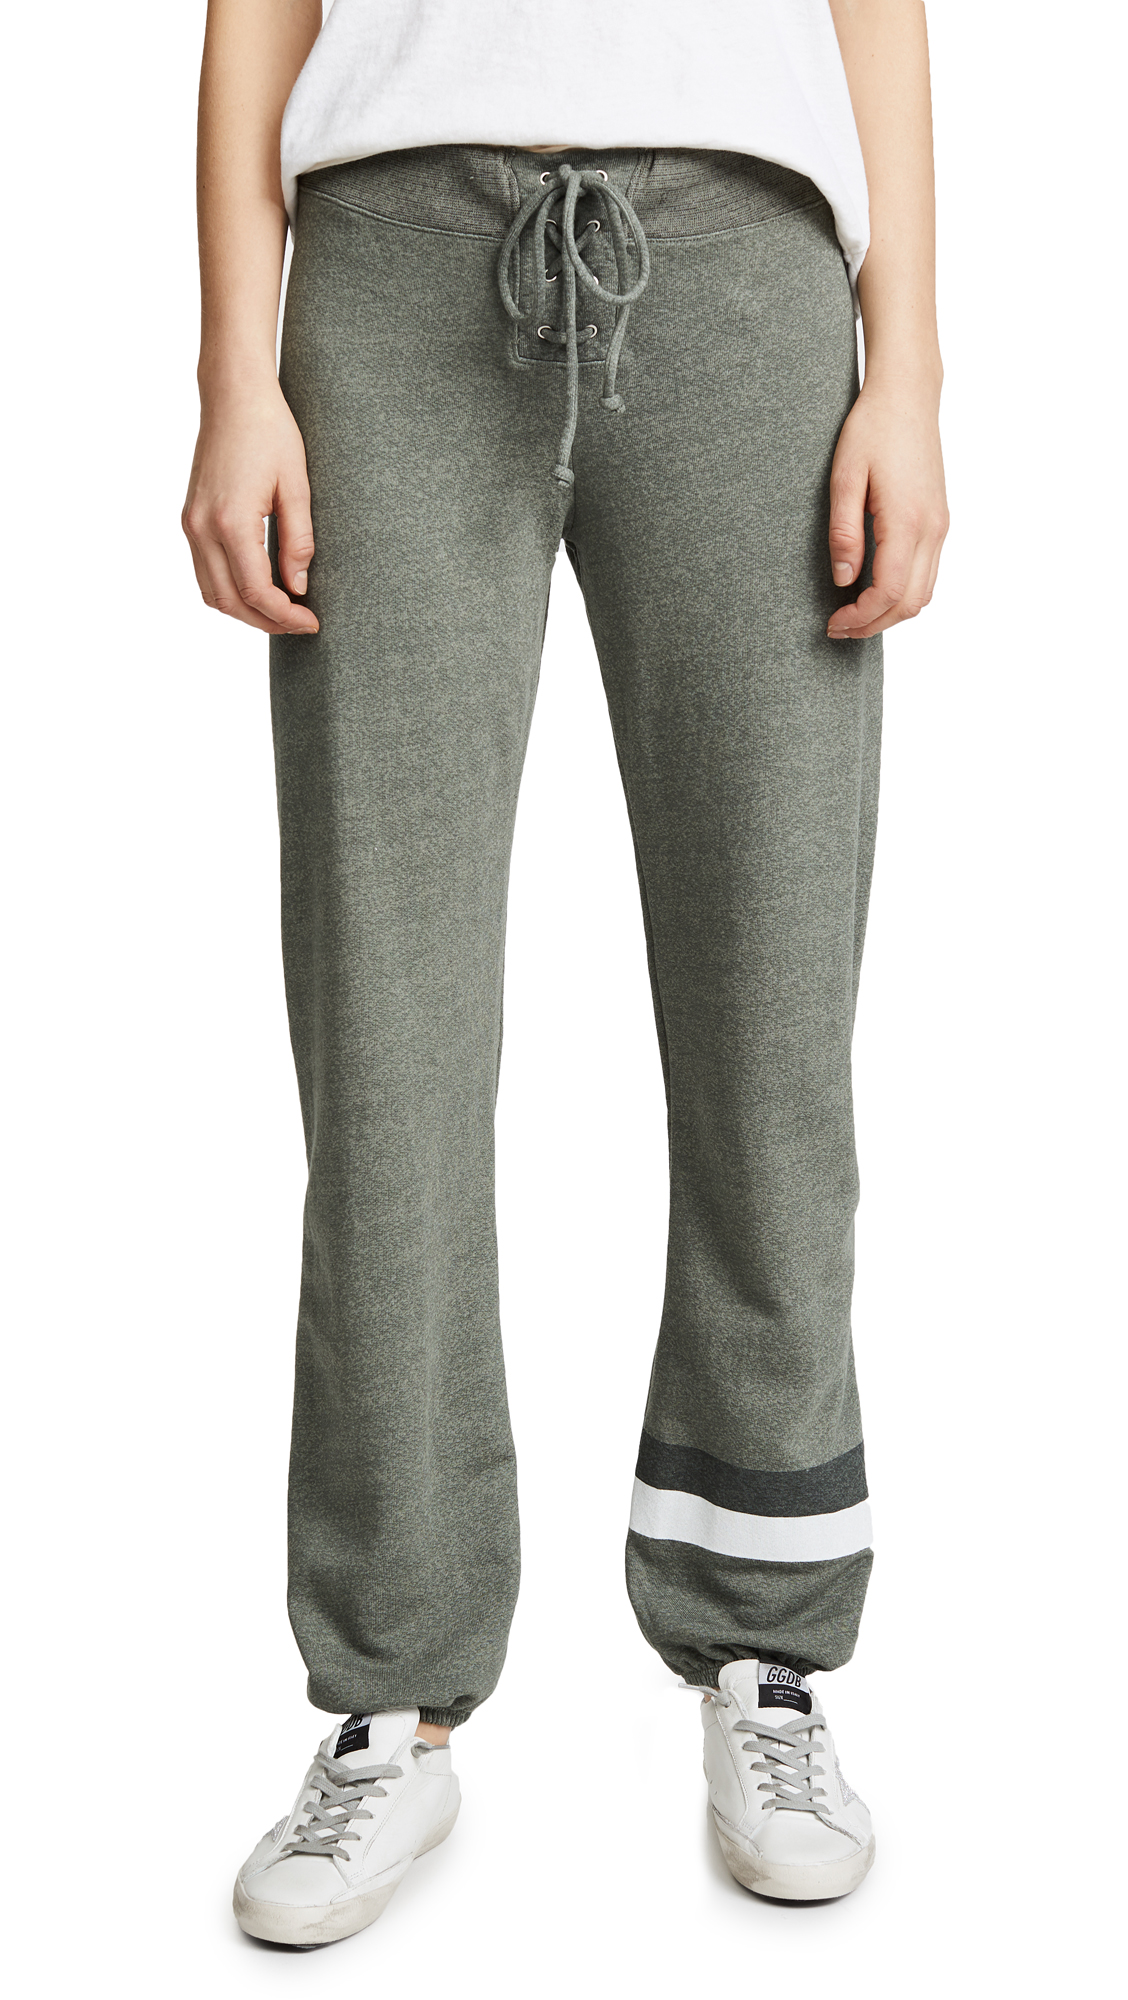 SUNDRY Lace Up Sweatpants